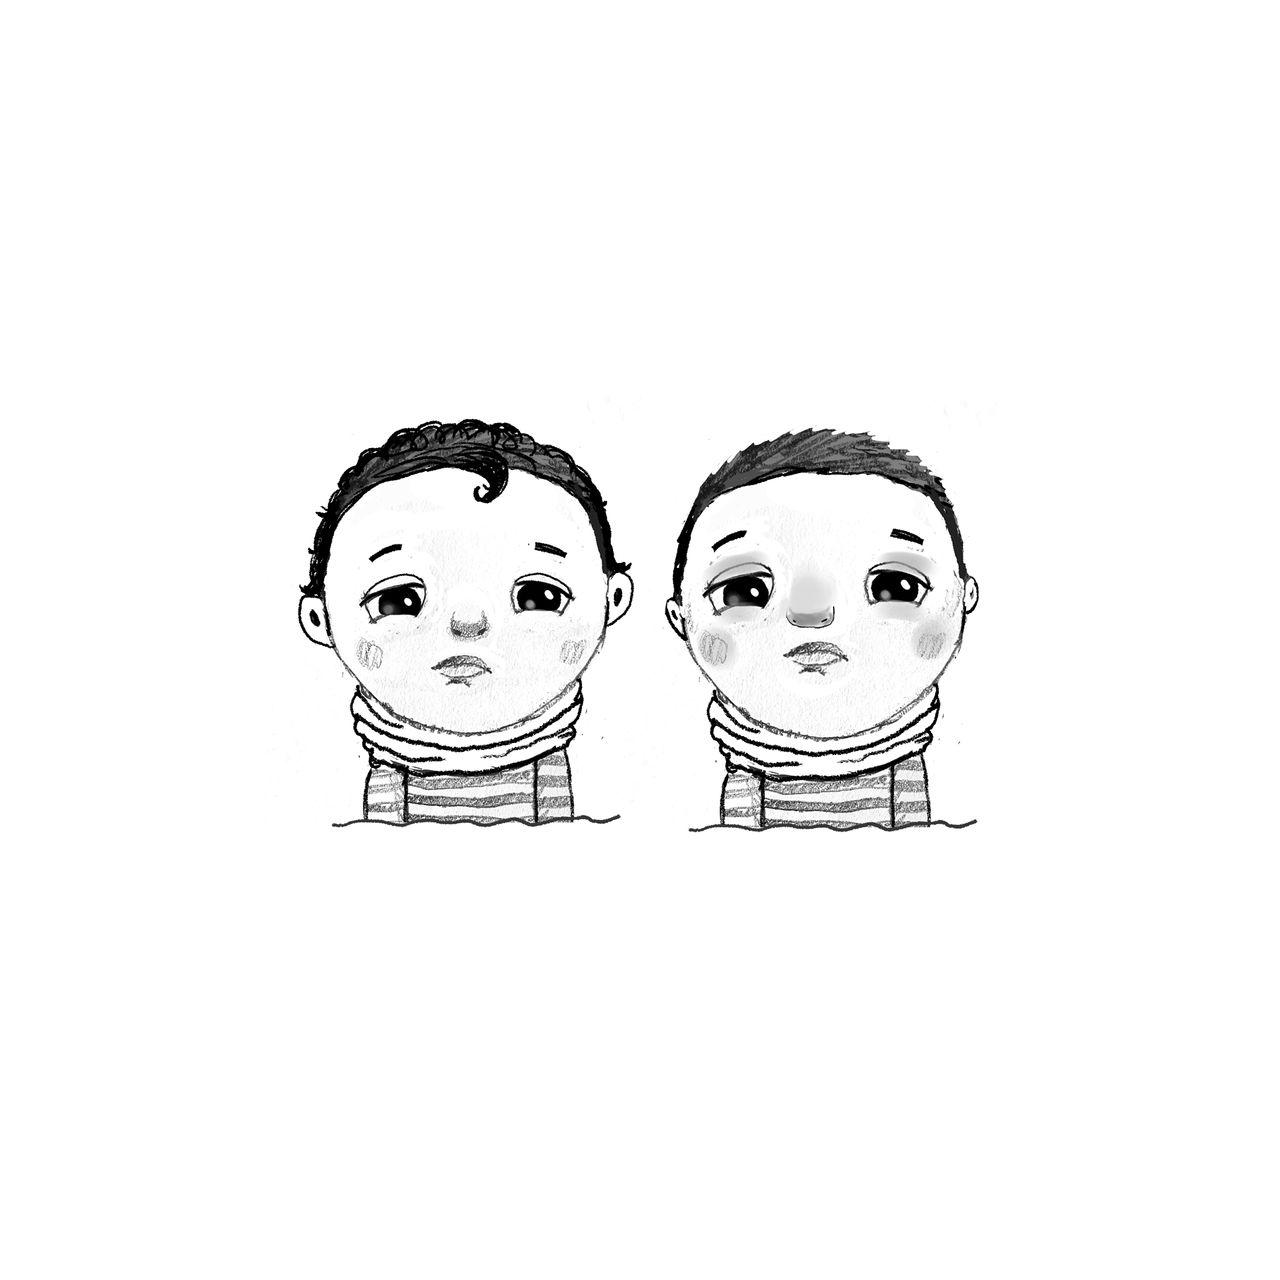 boy_sketch4.jpg